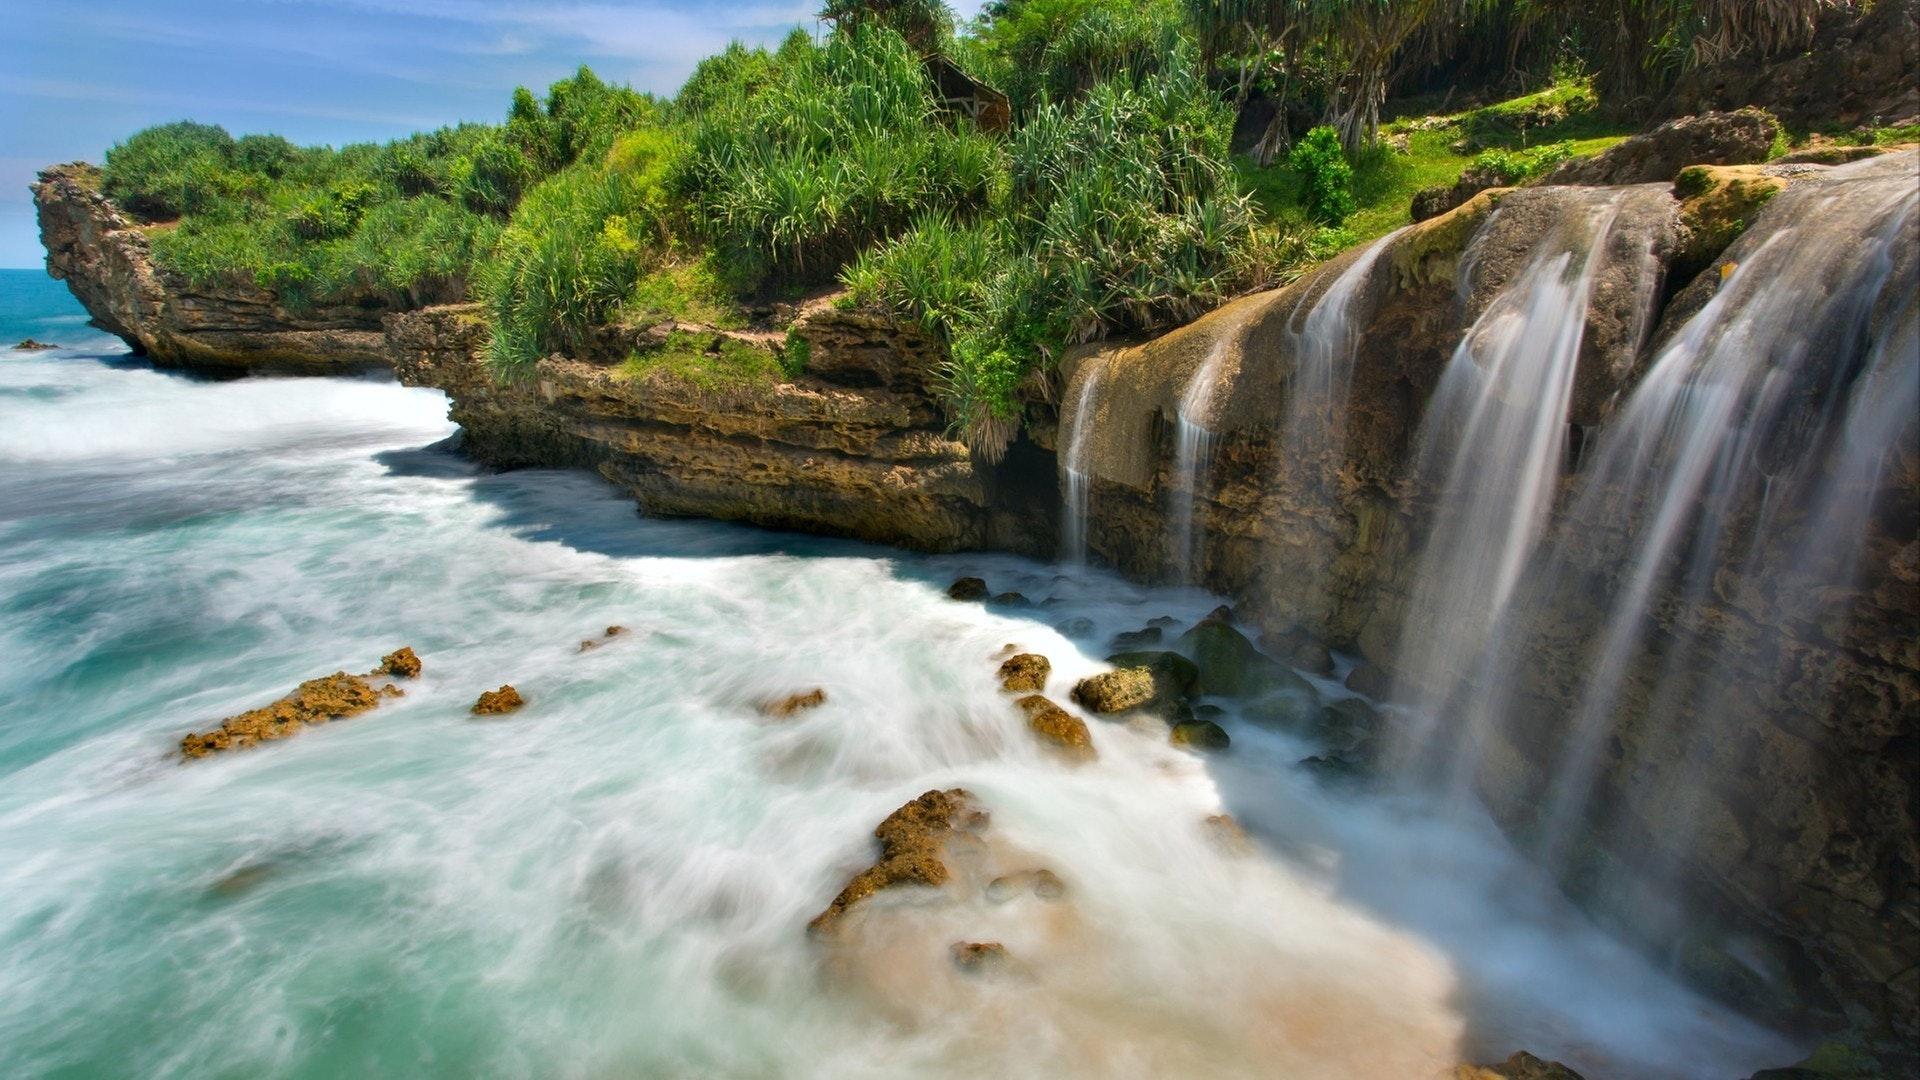 Beautiful Jogan waterfall falling to the ocean, Java, Indonesia